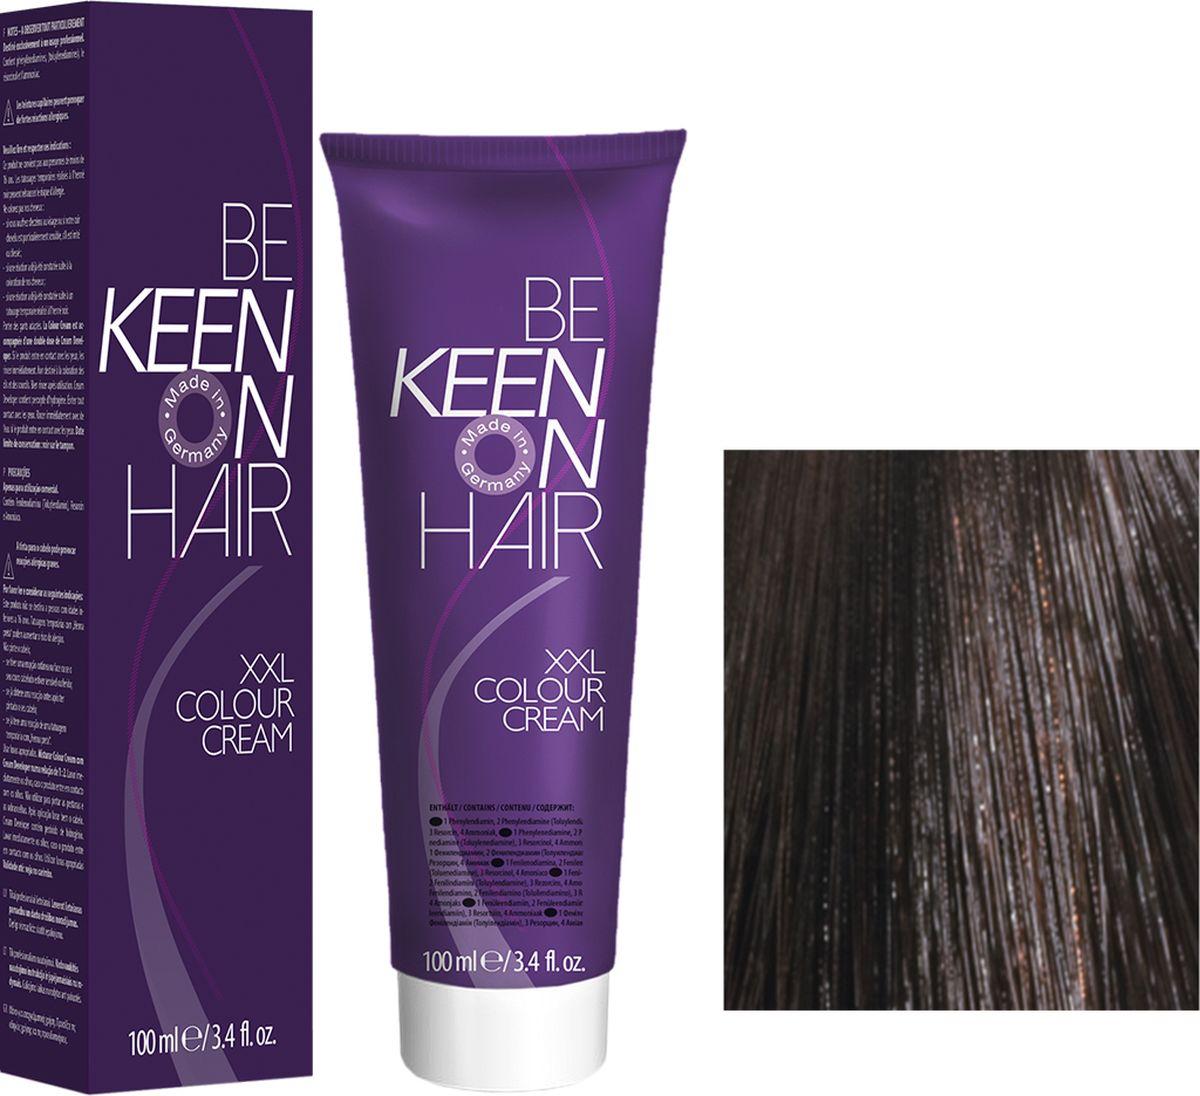 KeenКраска для волос 4. 7 Мокко Mokka, 100 мл